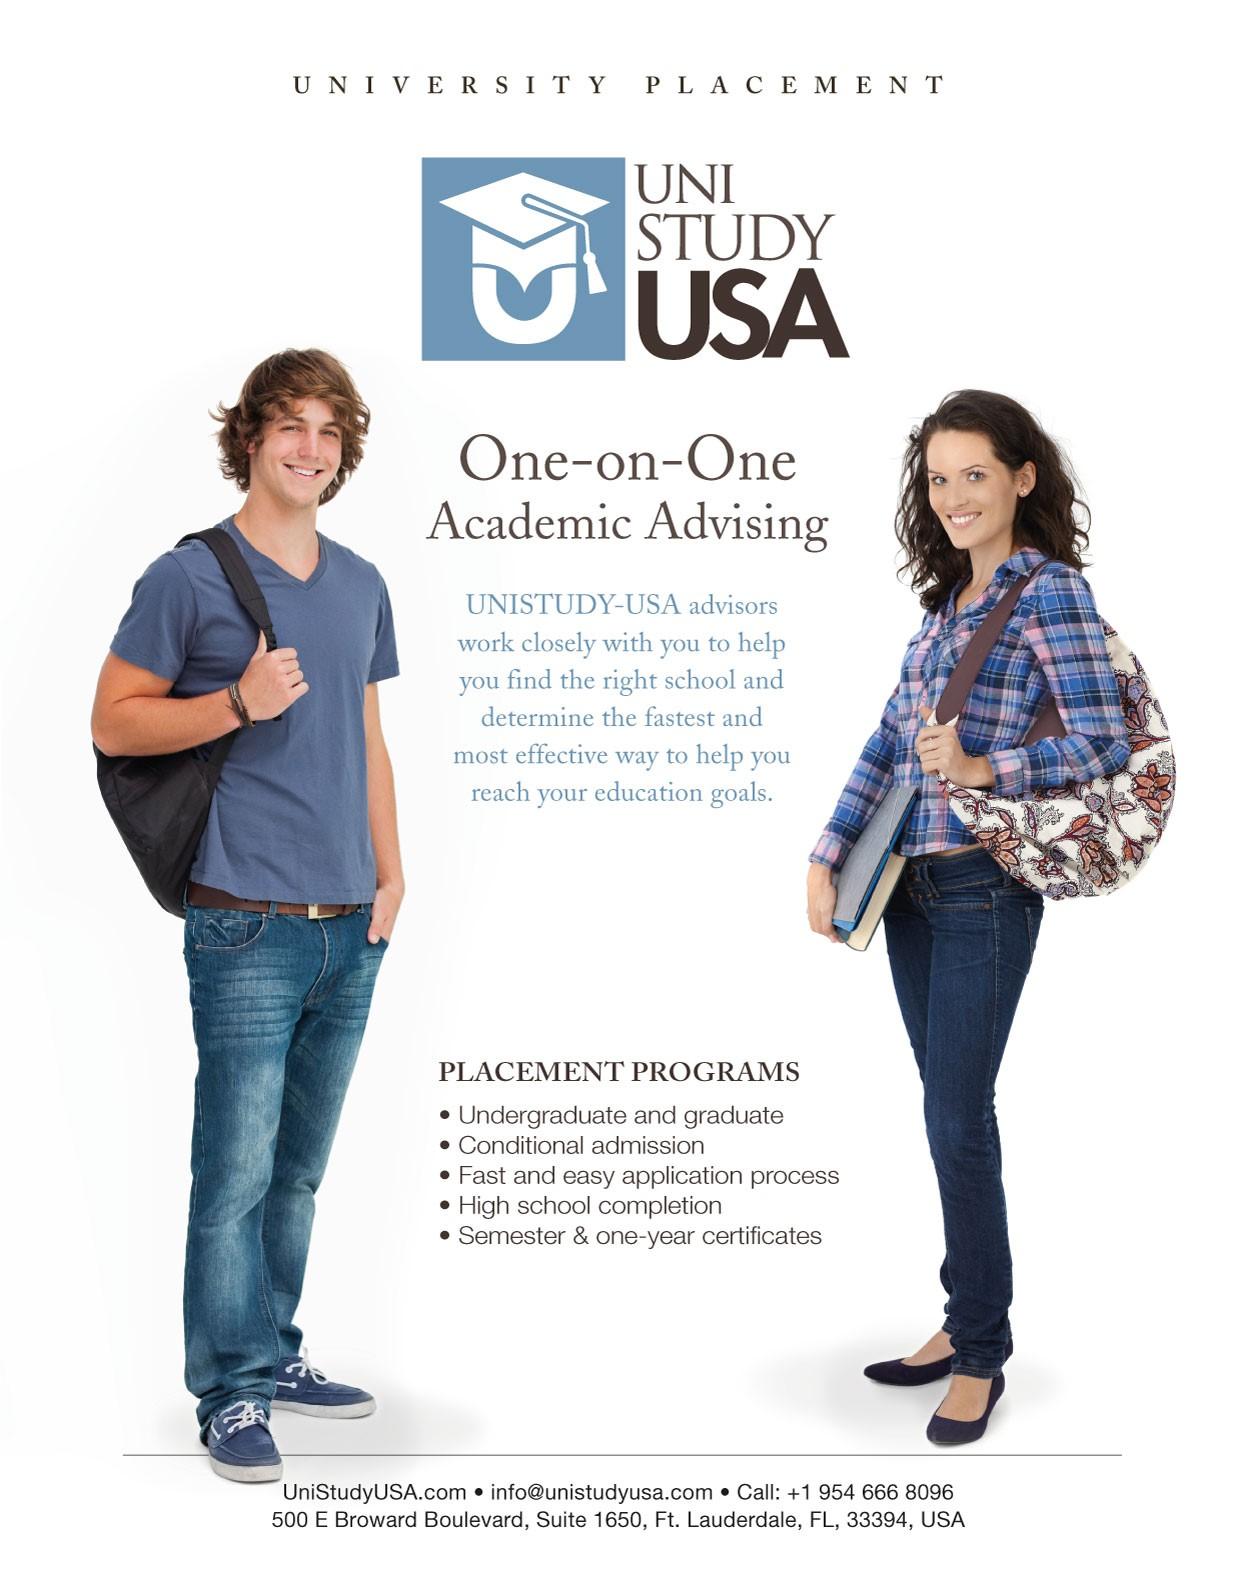 UniStudyUSA_Promo Flyer 2